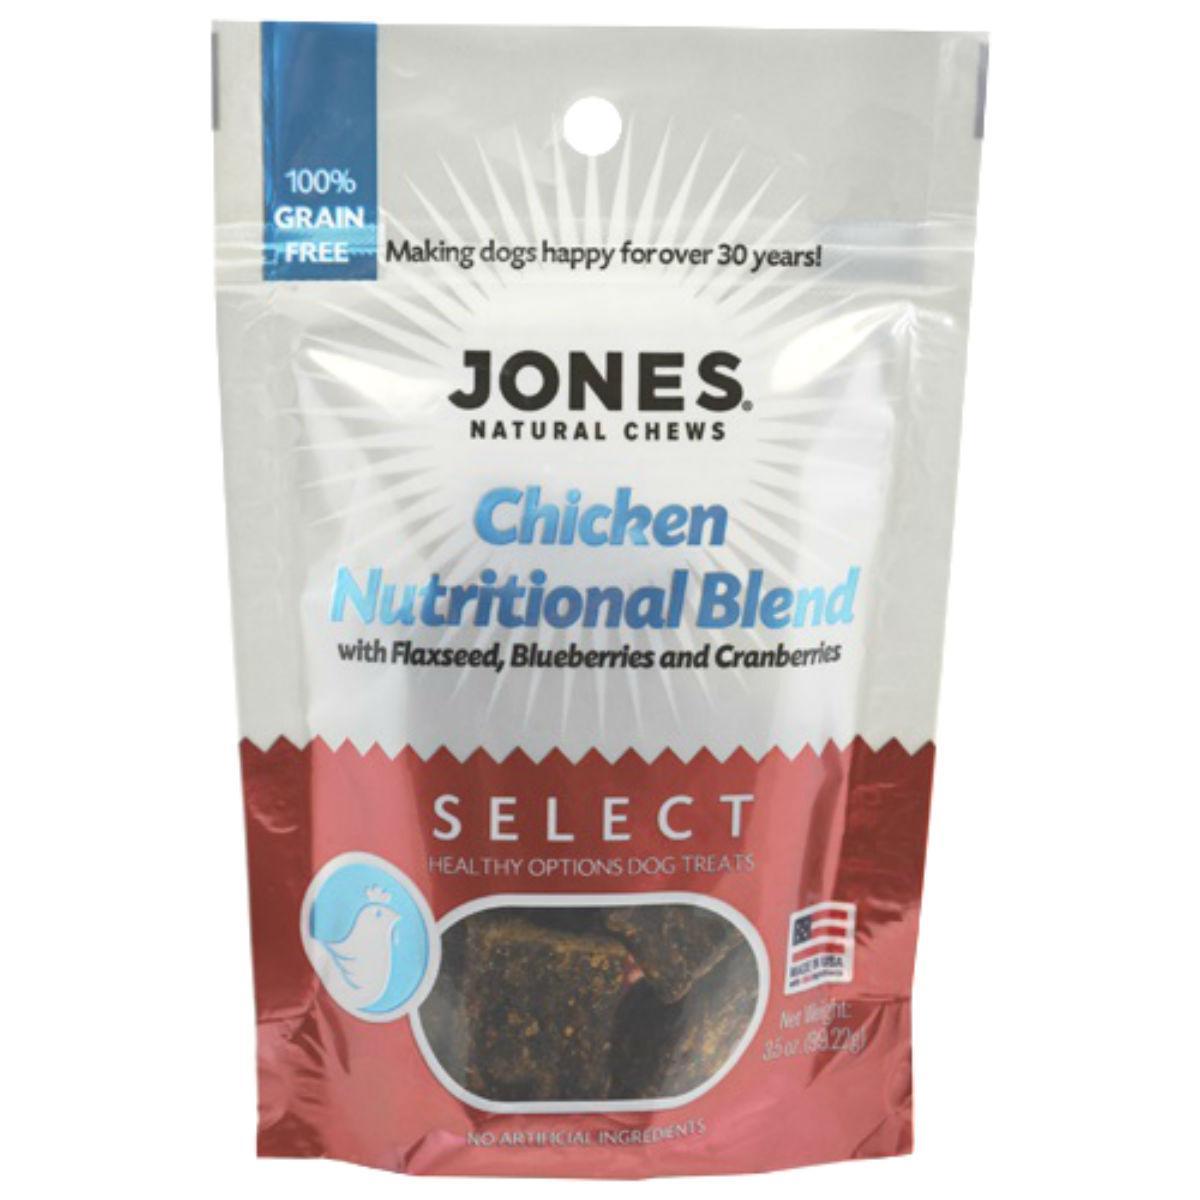 Jones Select Dog Treat - Chicken Nutritional Blend